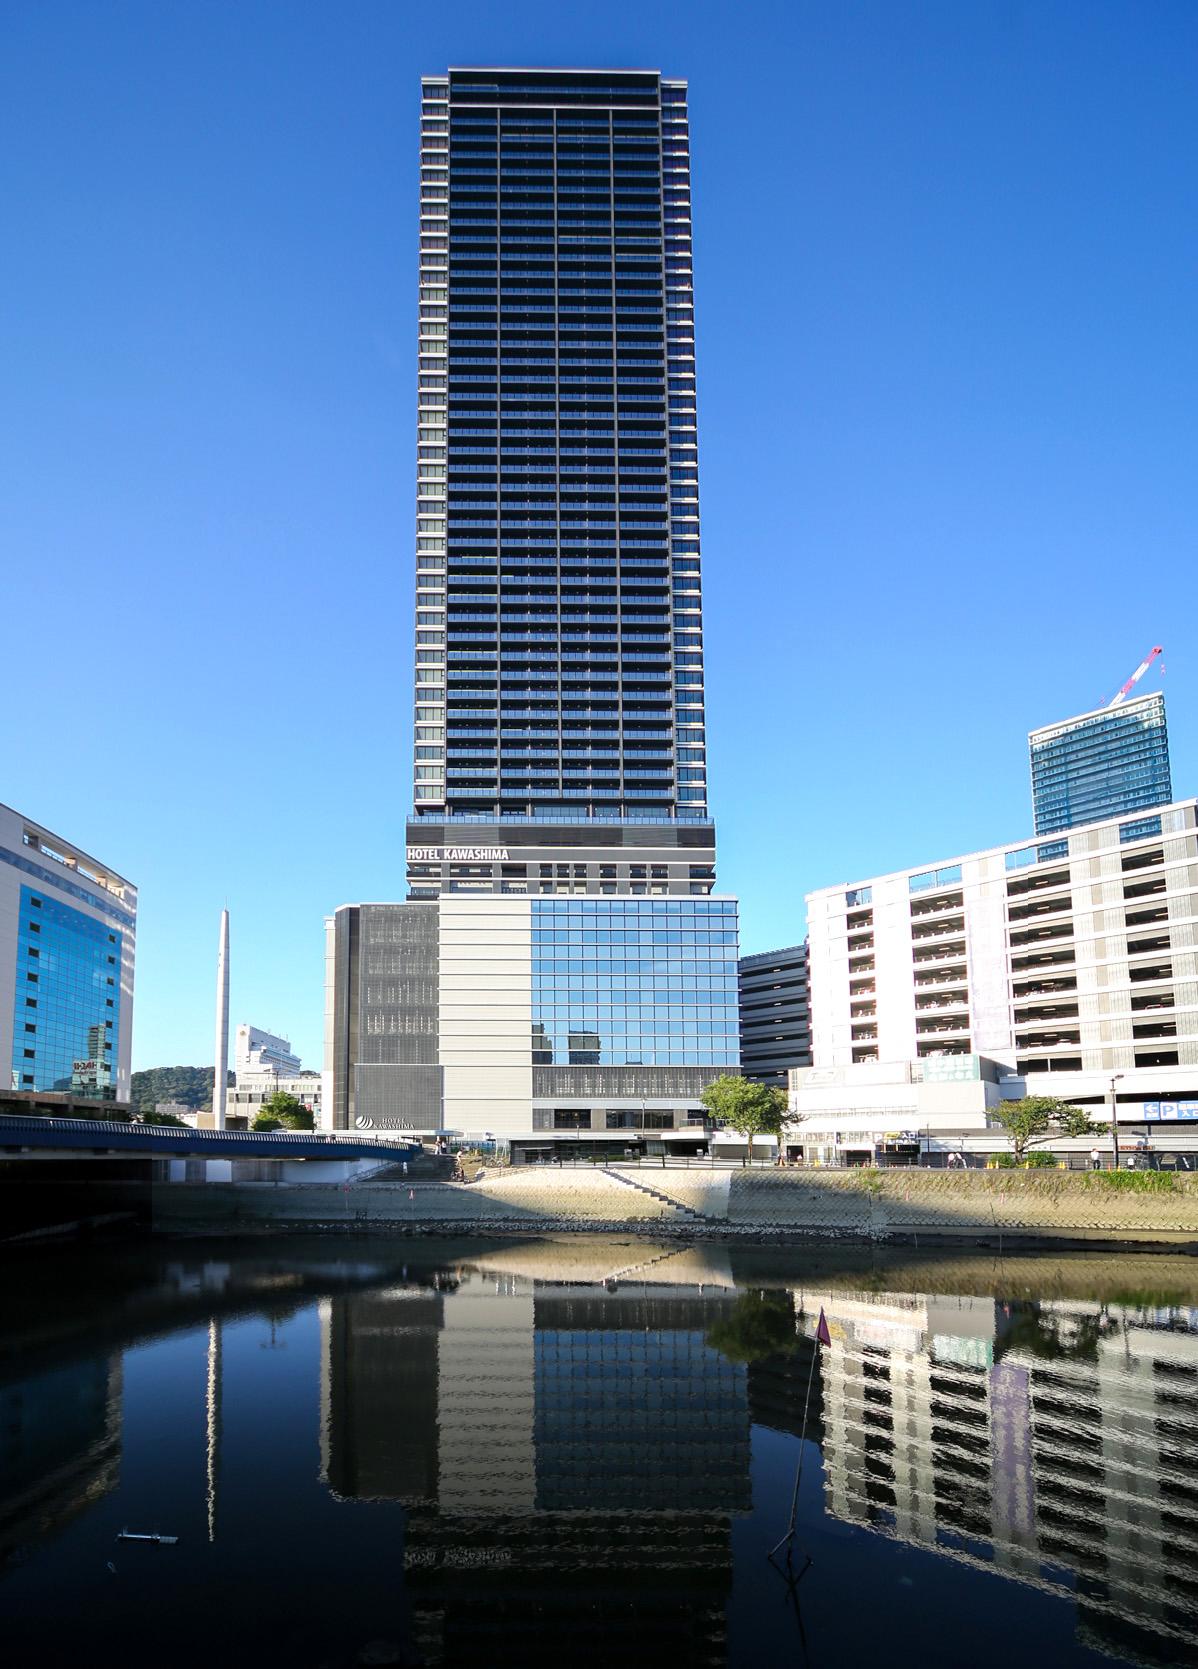 ホテル川島 広島駅直結写真